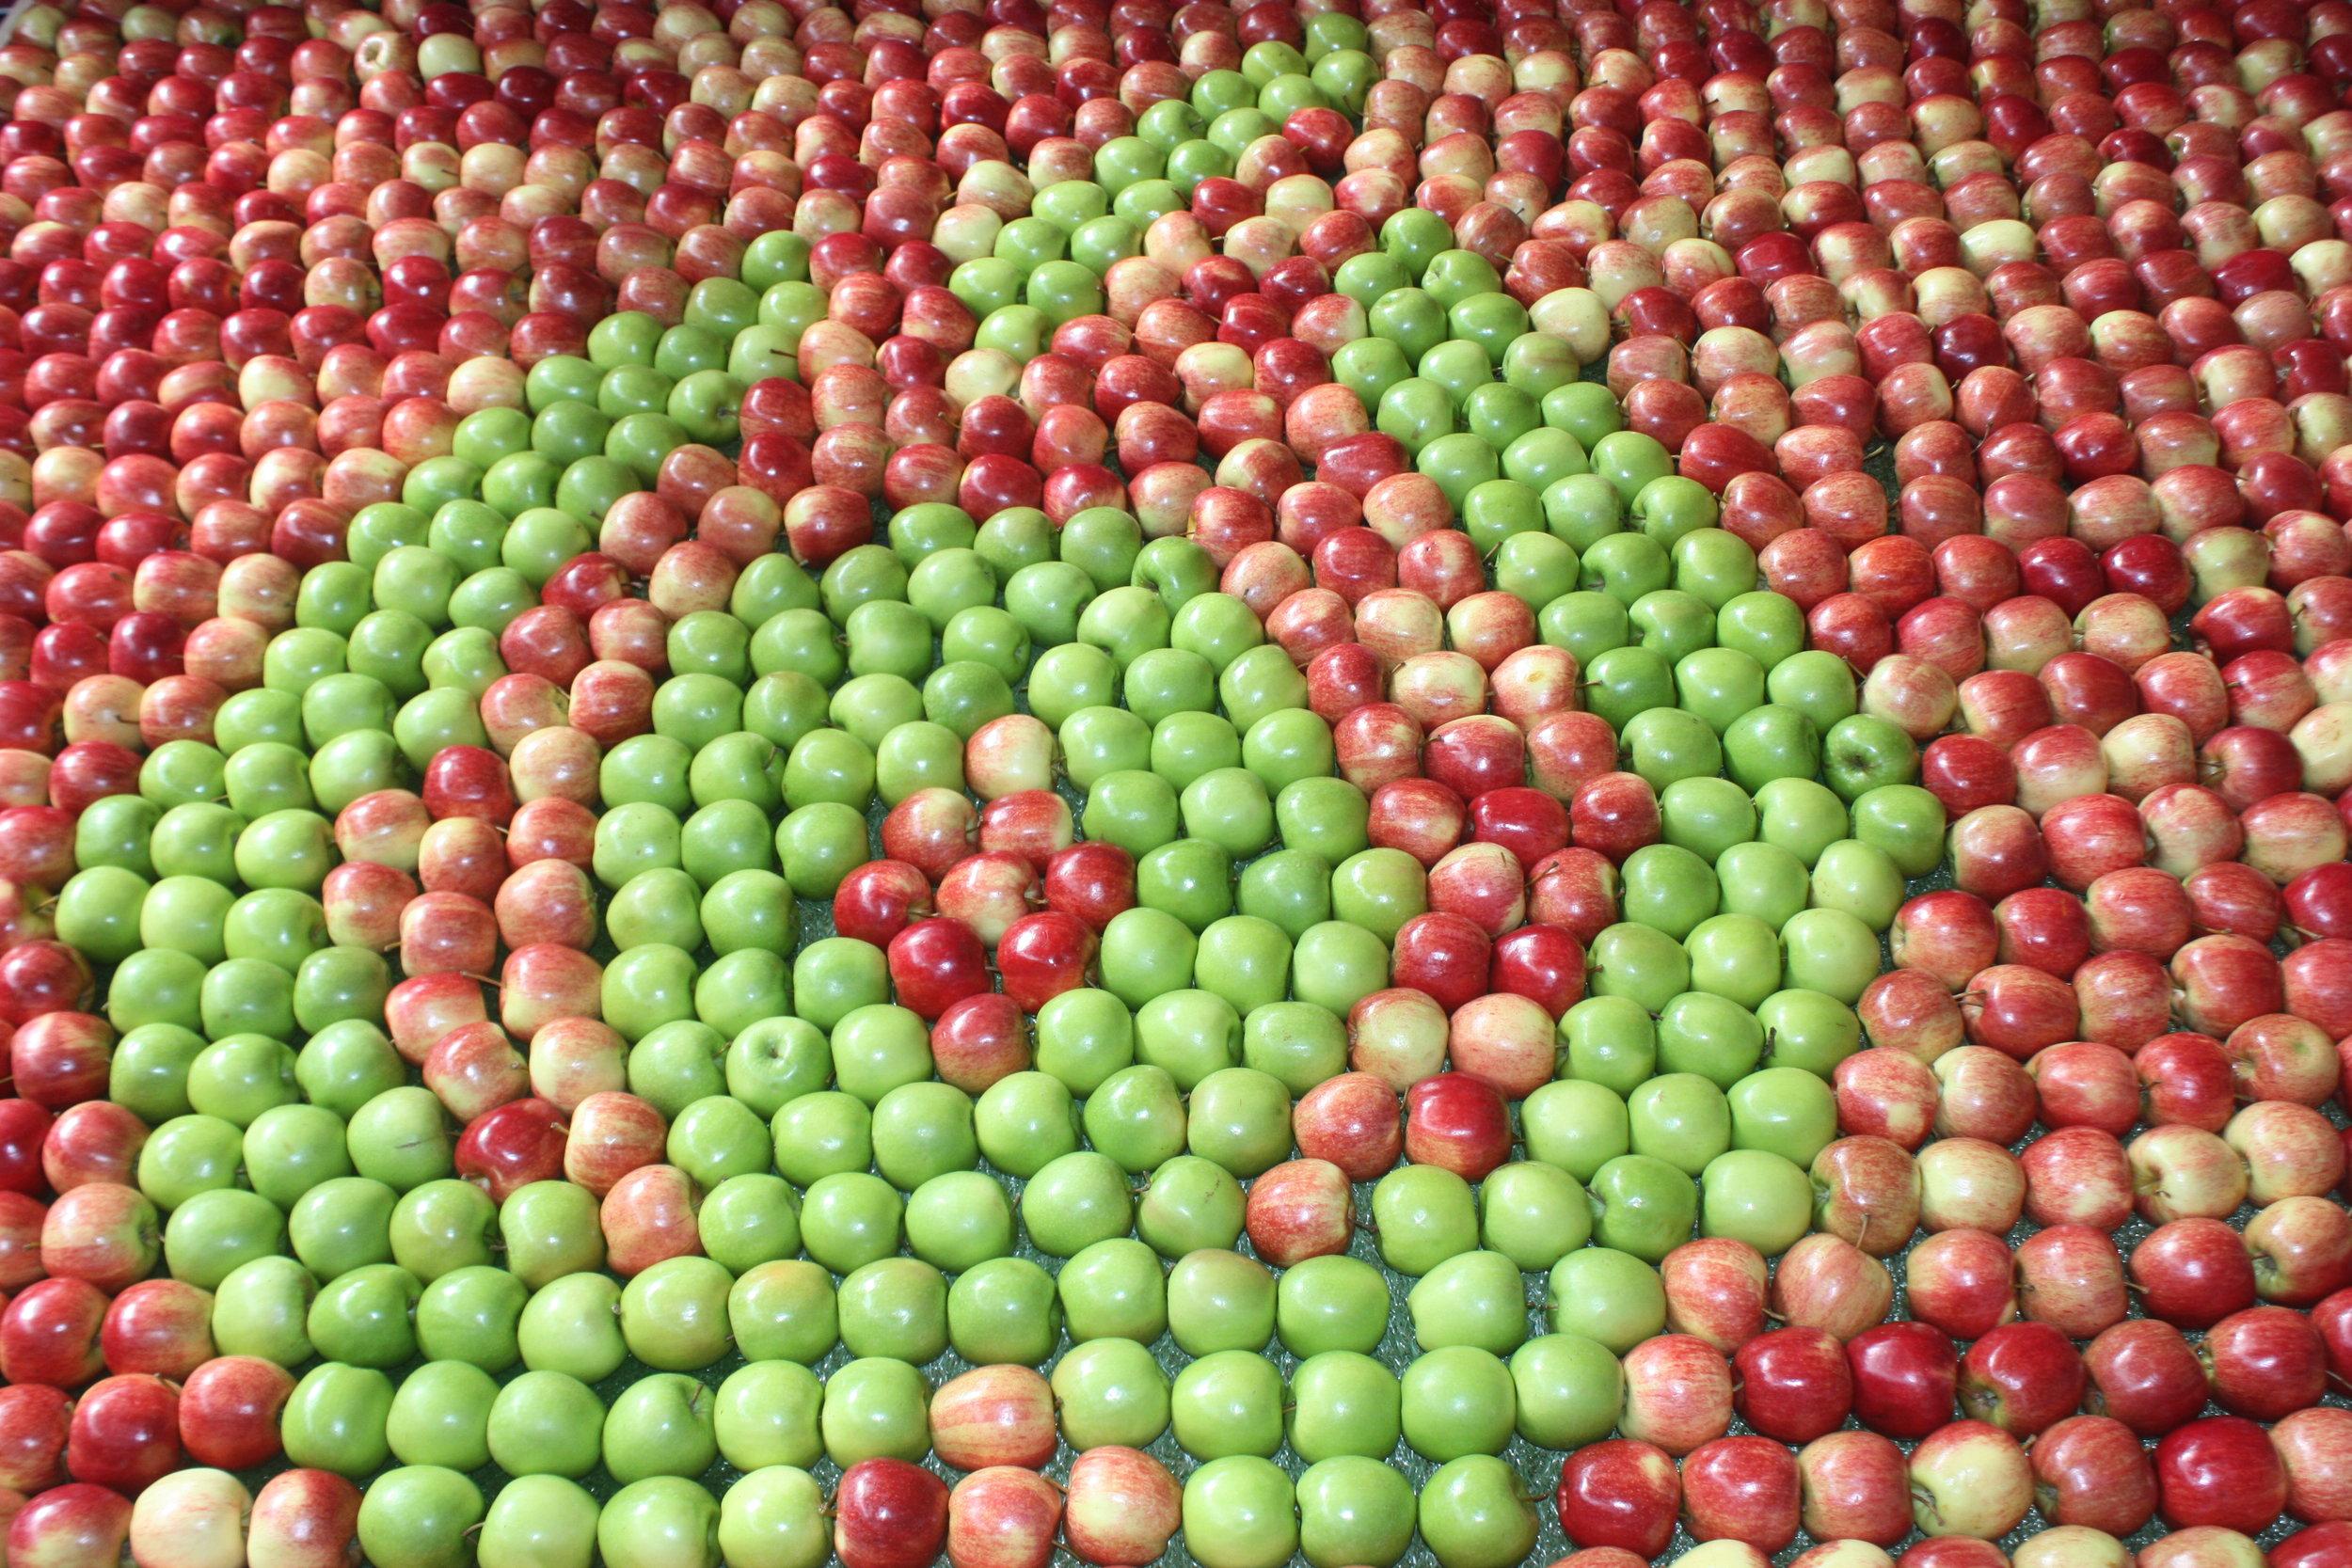 Woolworths apple display